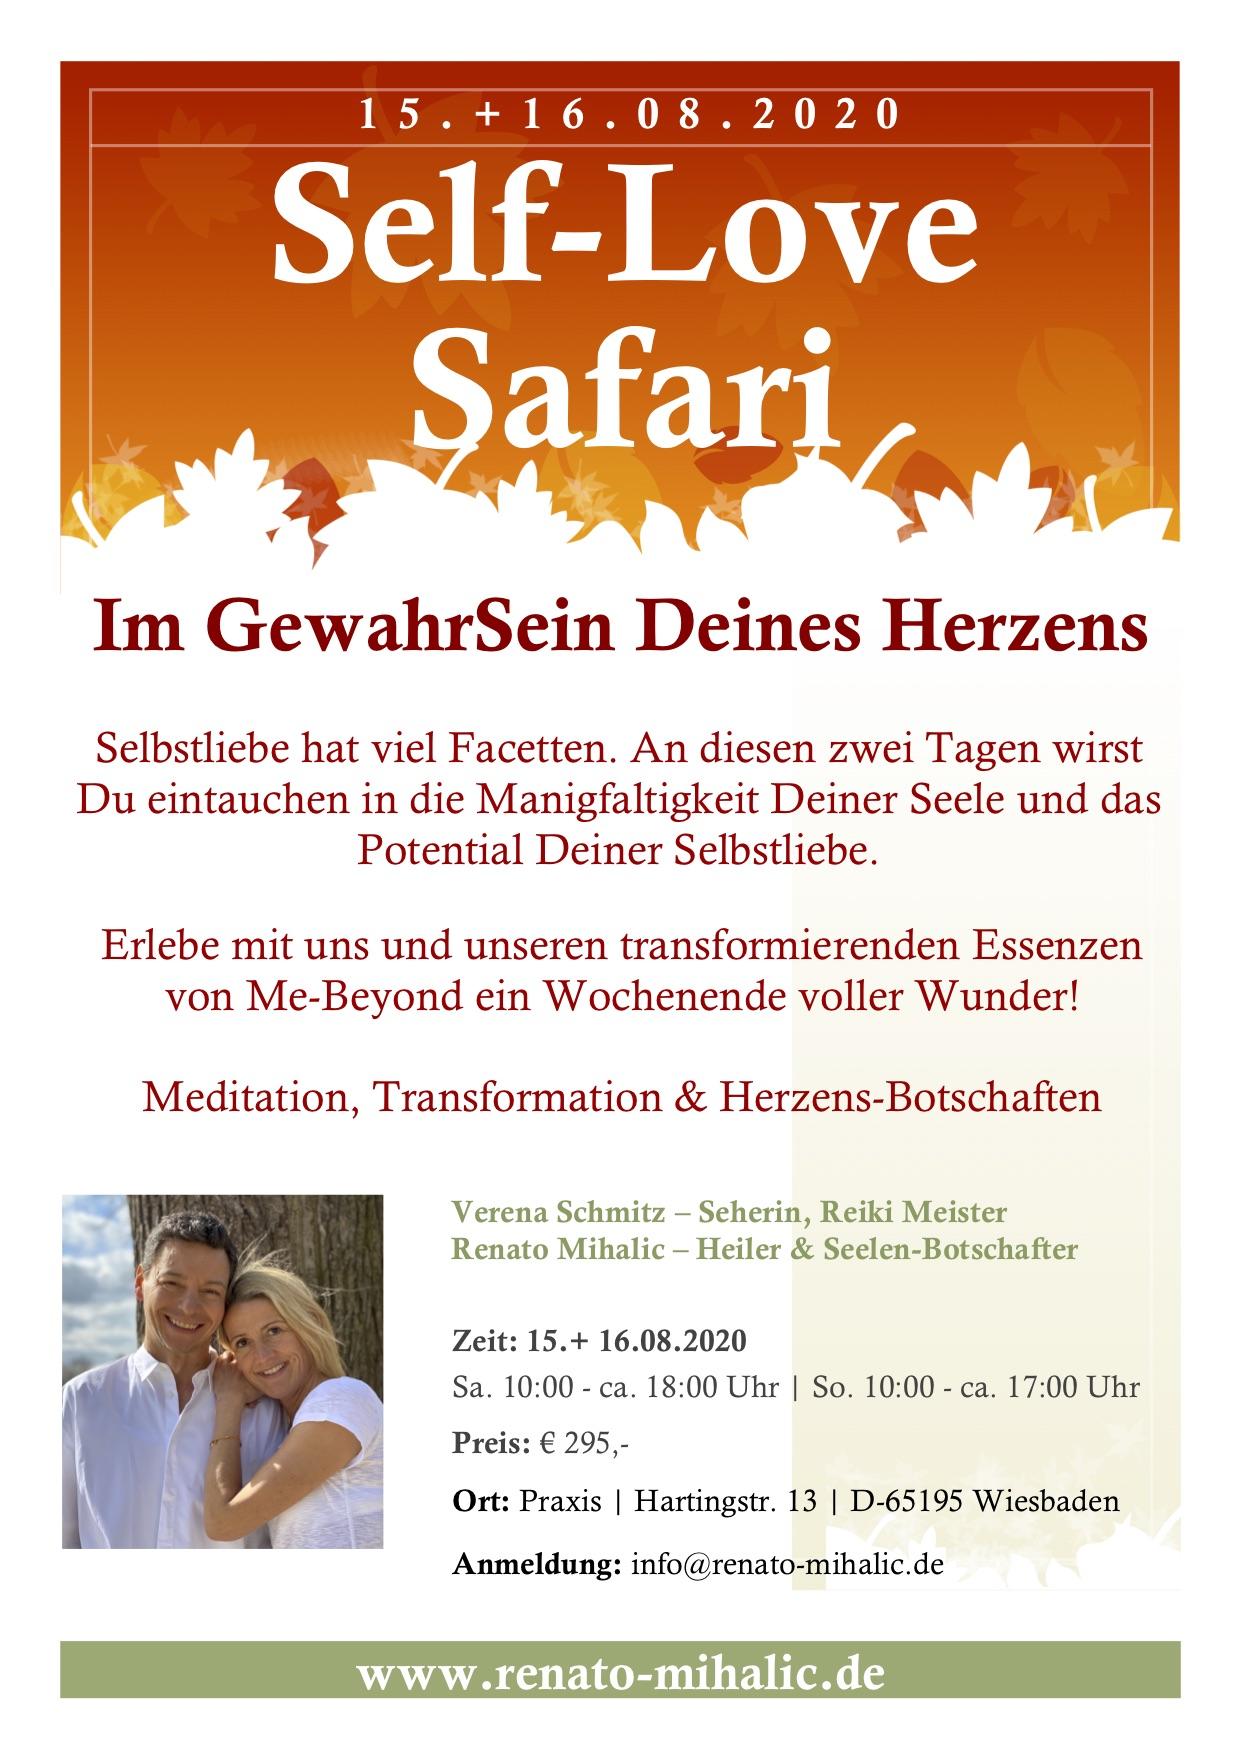 Self-Love Safari